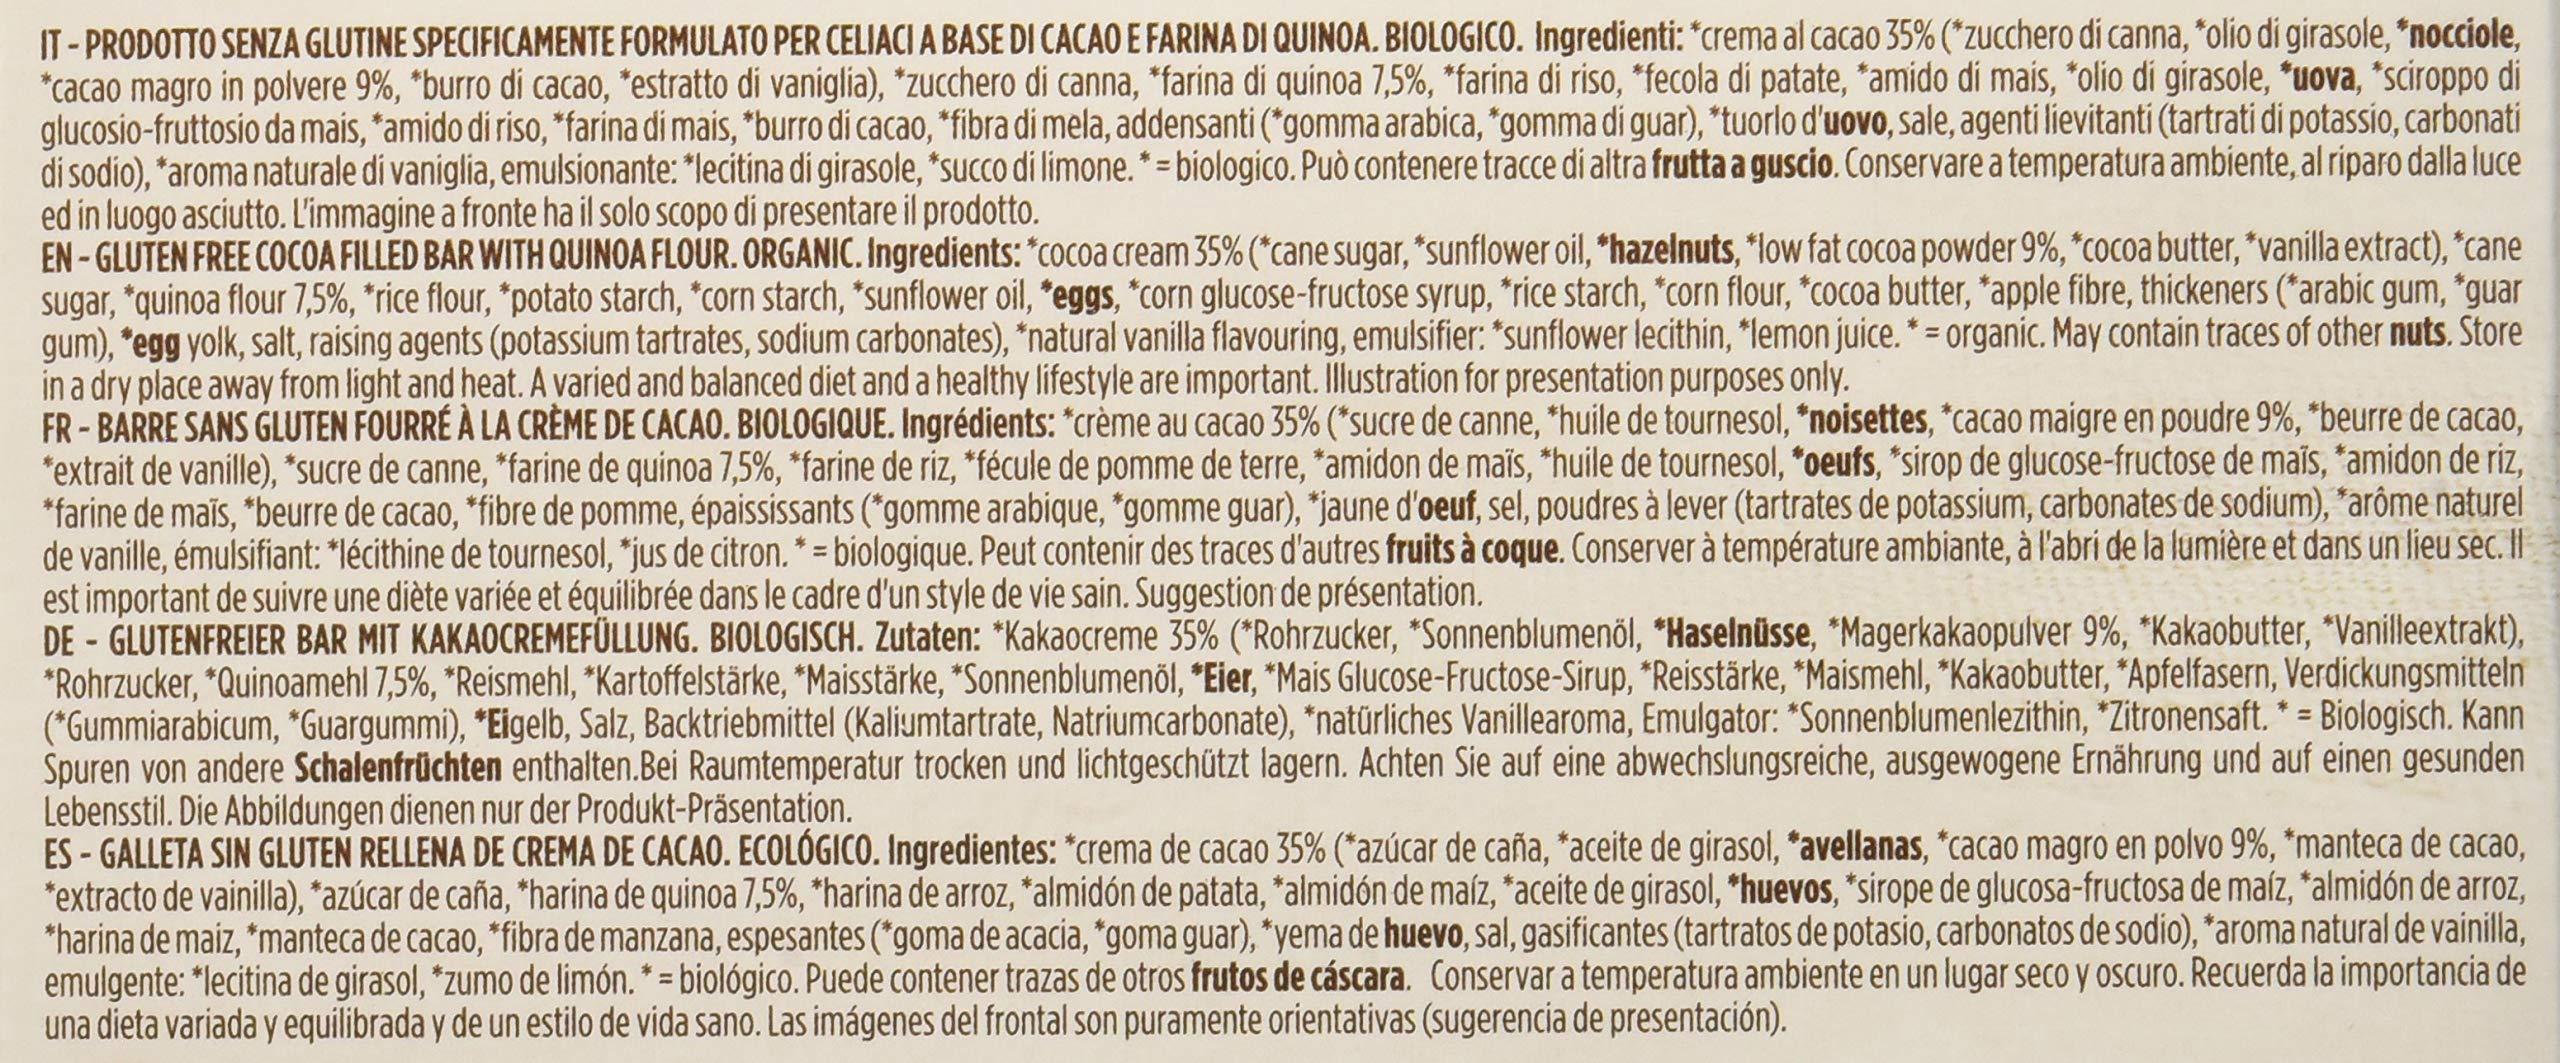 Germinal Bio Barretta Cacao Quinoa - 1800 gr, Senza glutine 4 spesavip